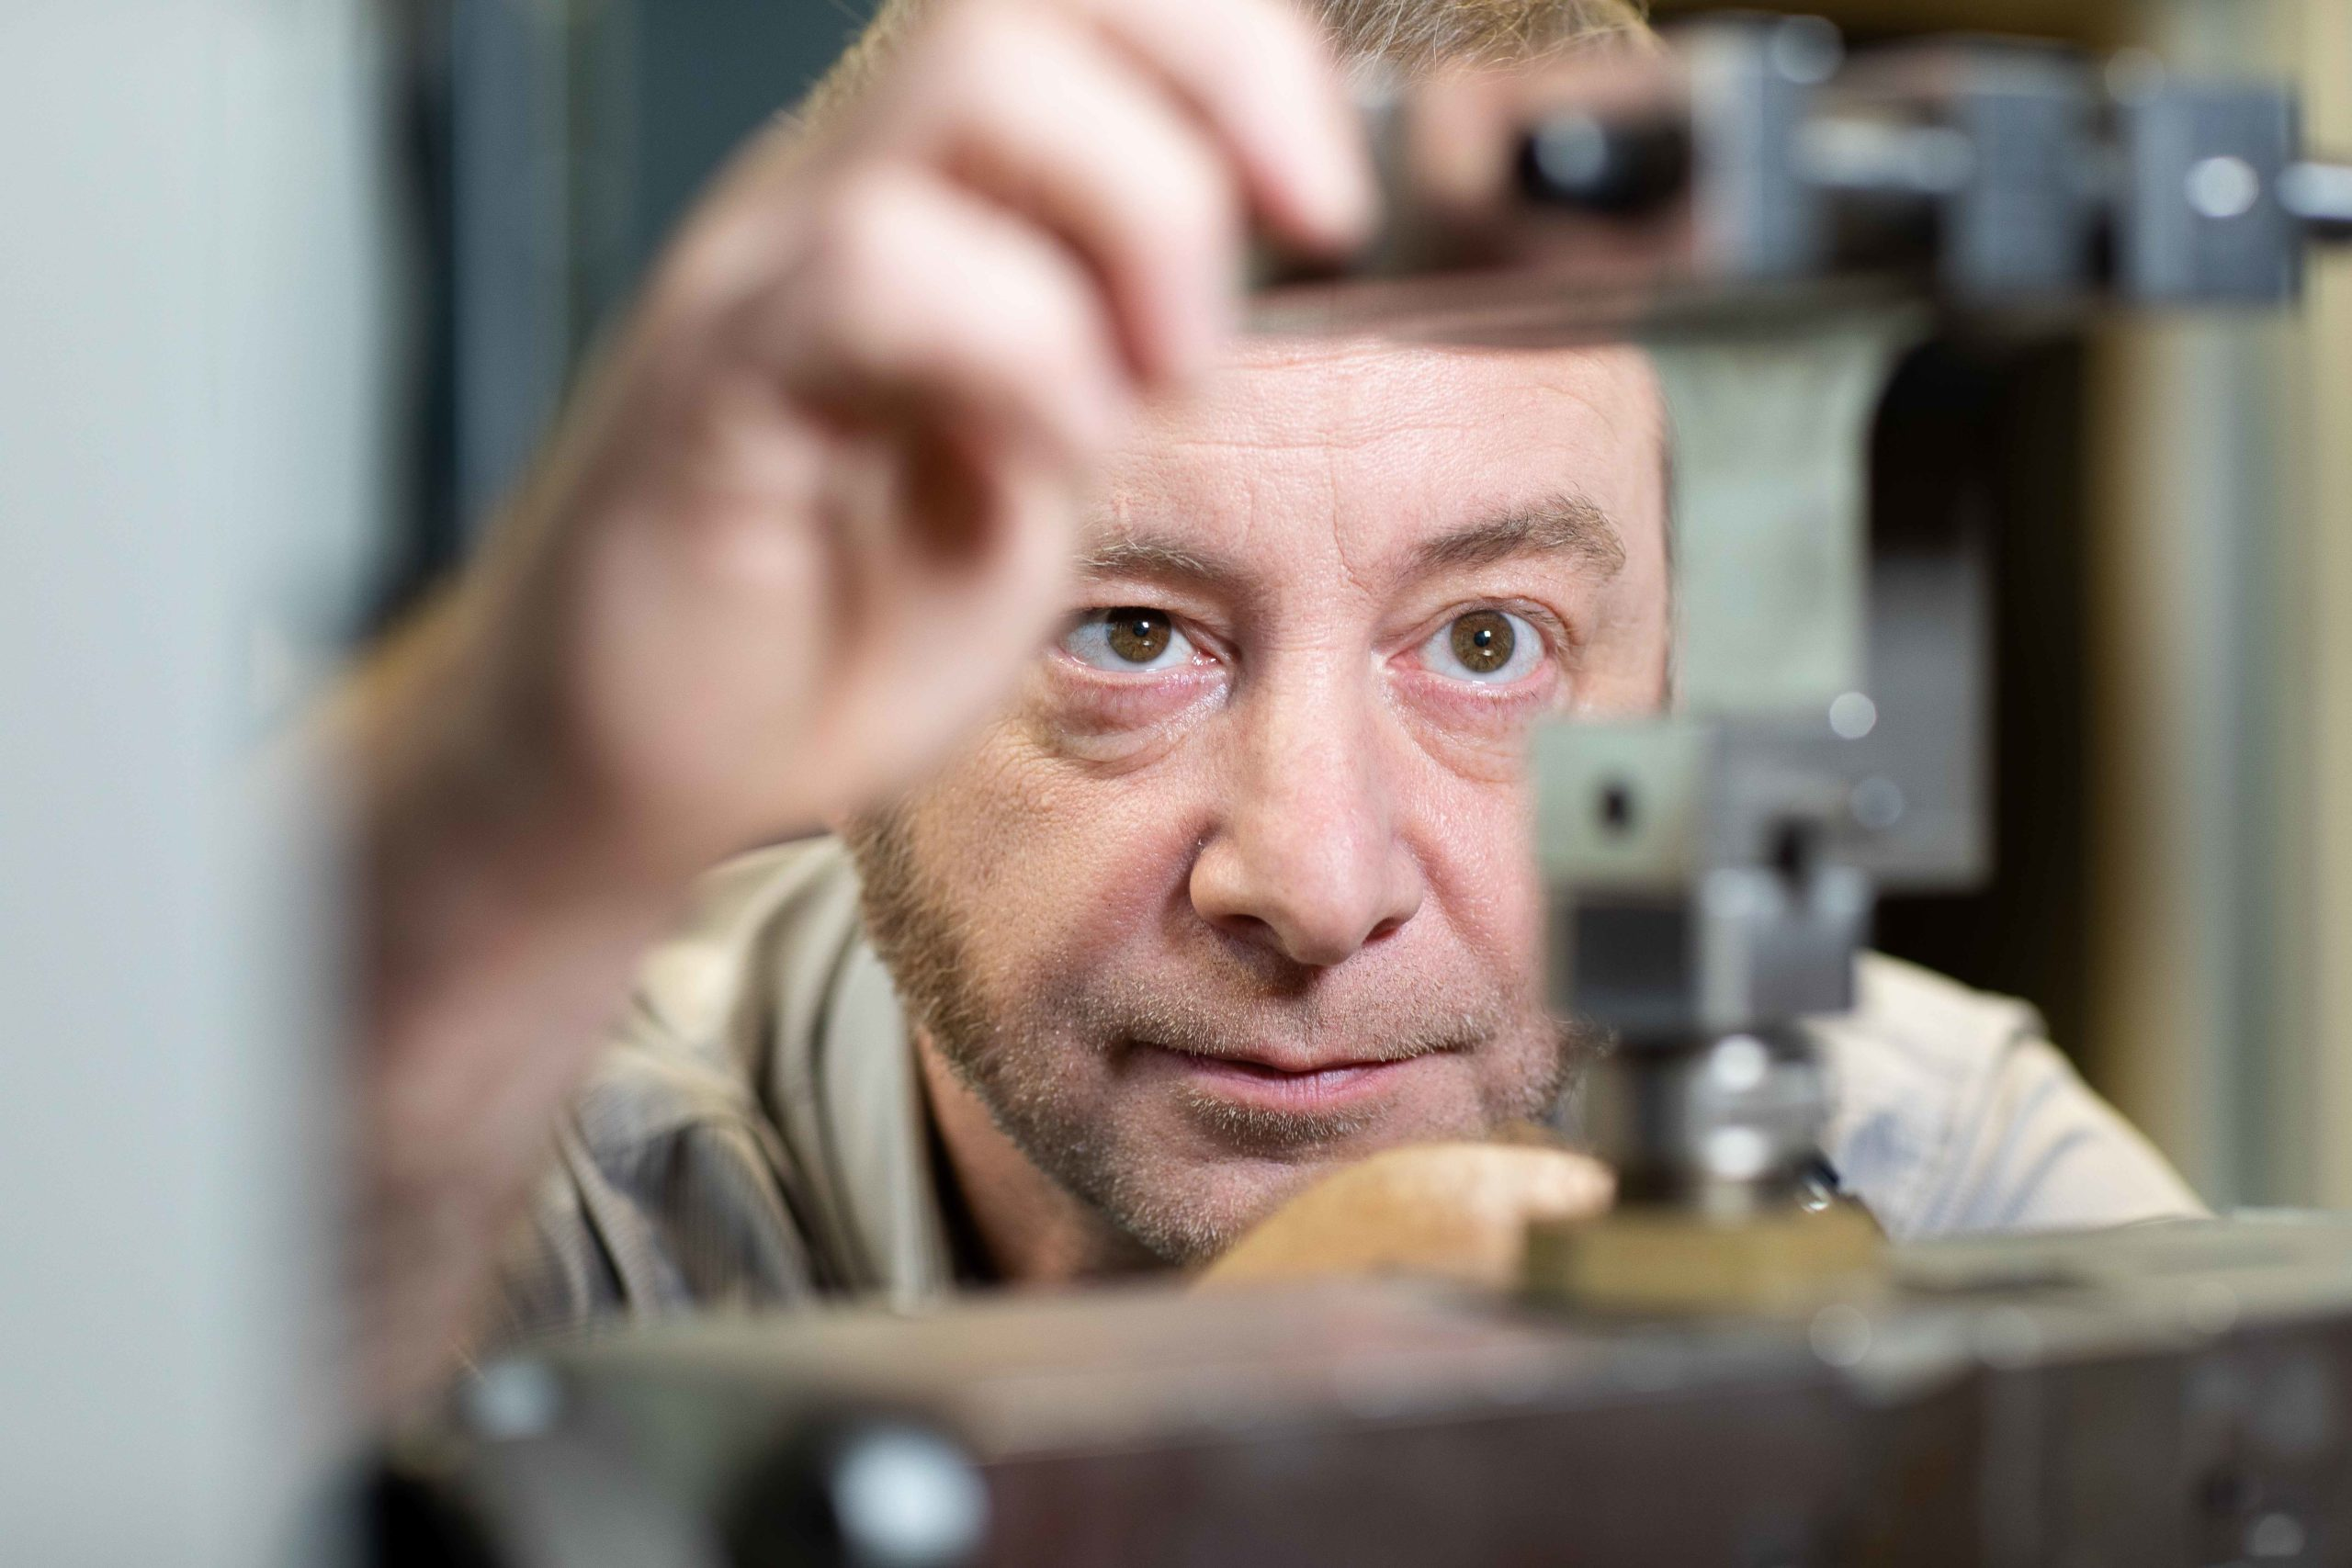 Dipl.-Ing. Andreas Mainz | Polymer Engineering Bayreuth